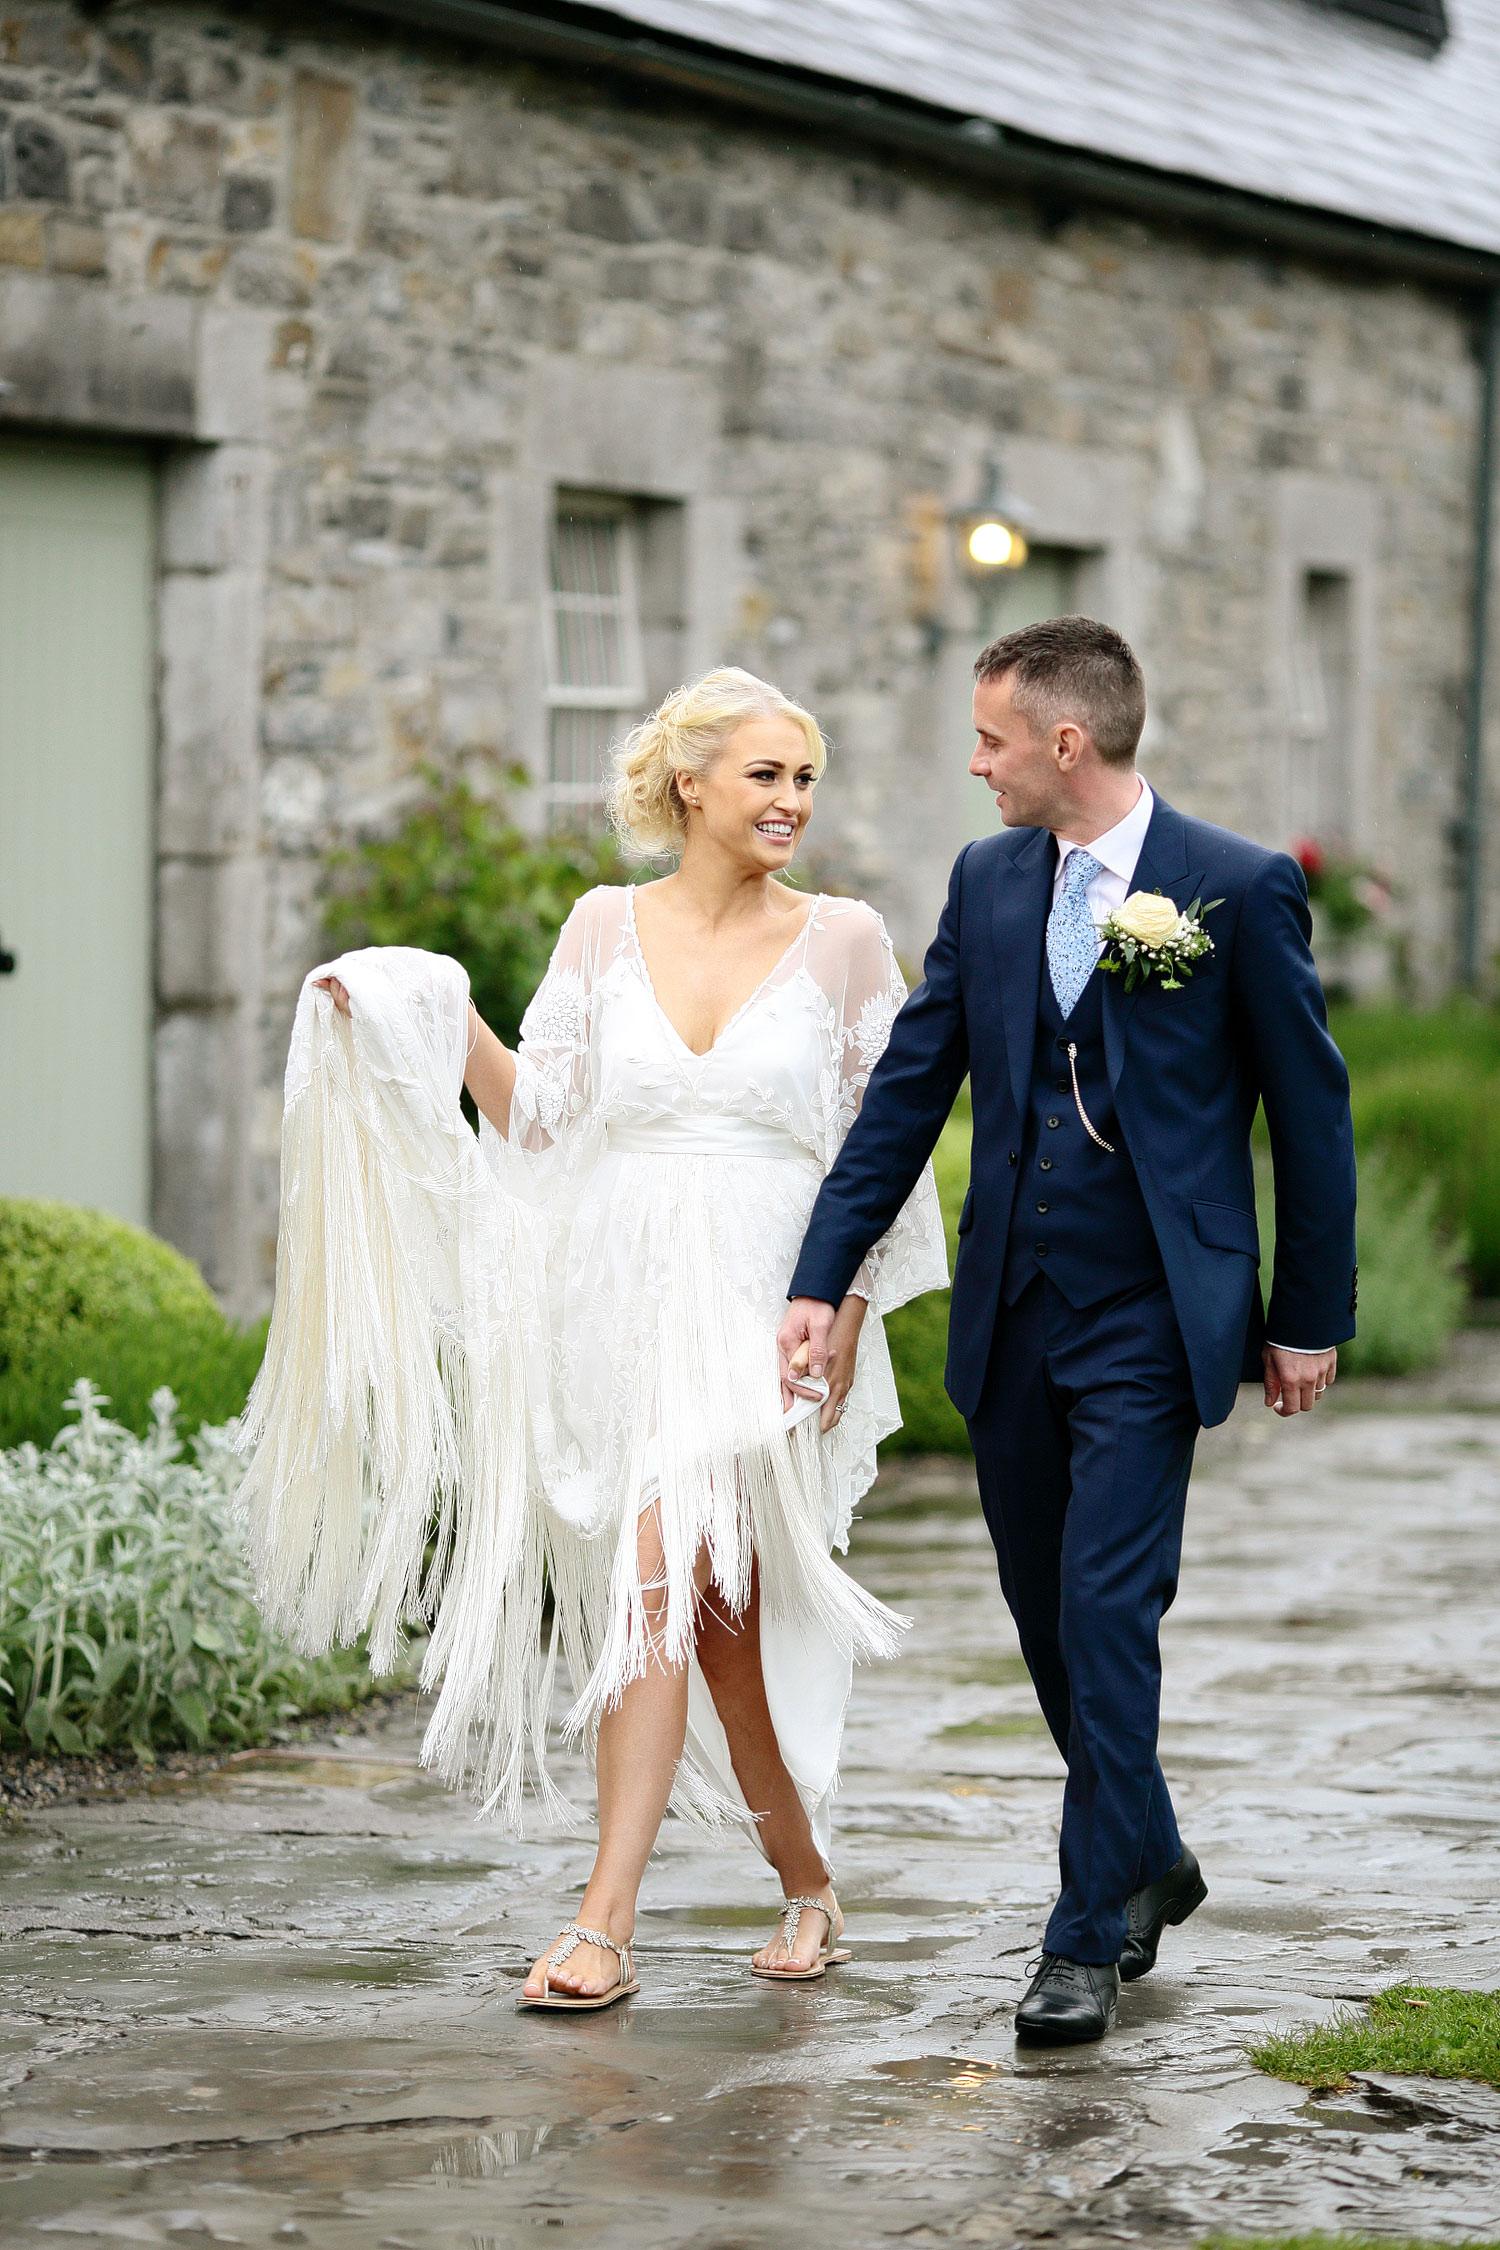 Ballymagarvey wedding photos 37.jpg